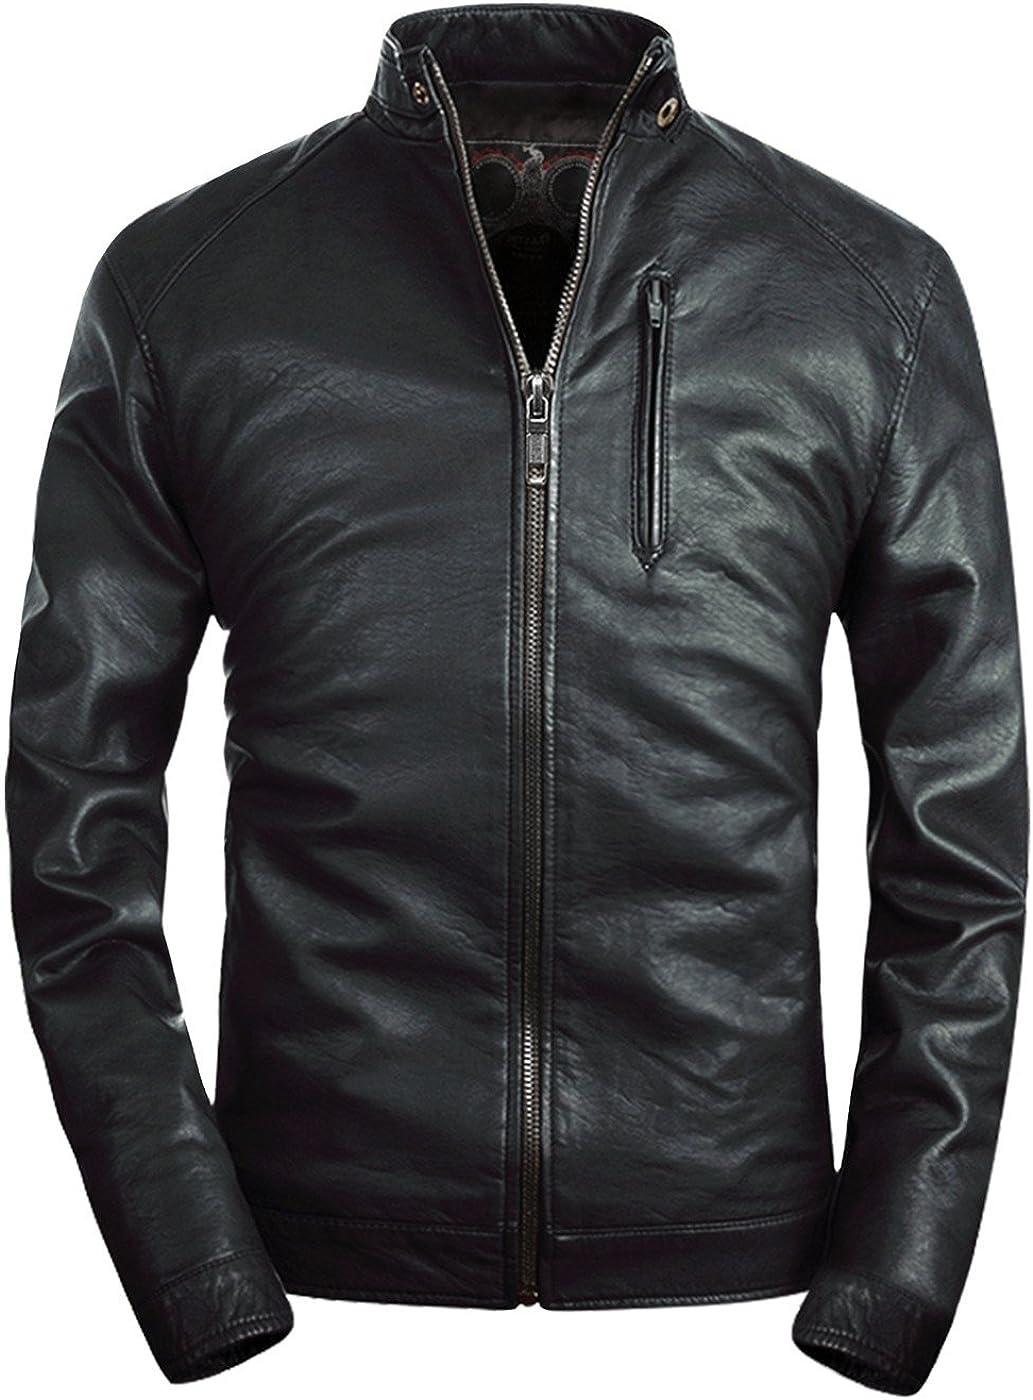 Fairylinks Mens Leather Jacket Classic Moto Zip Up Black